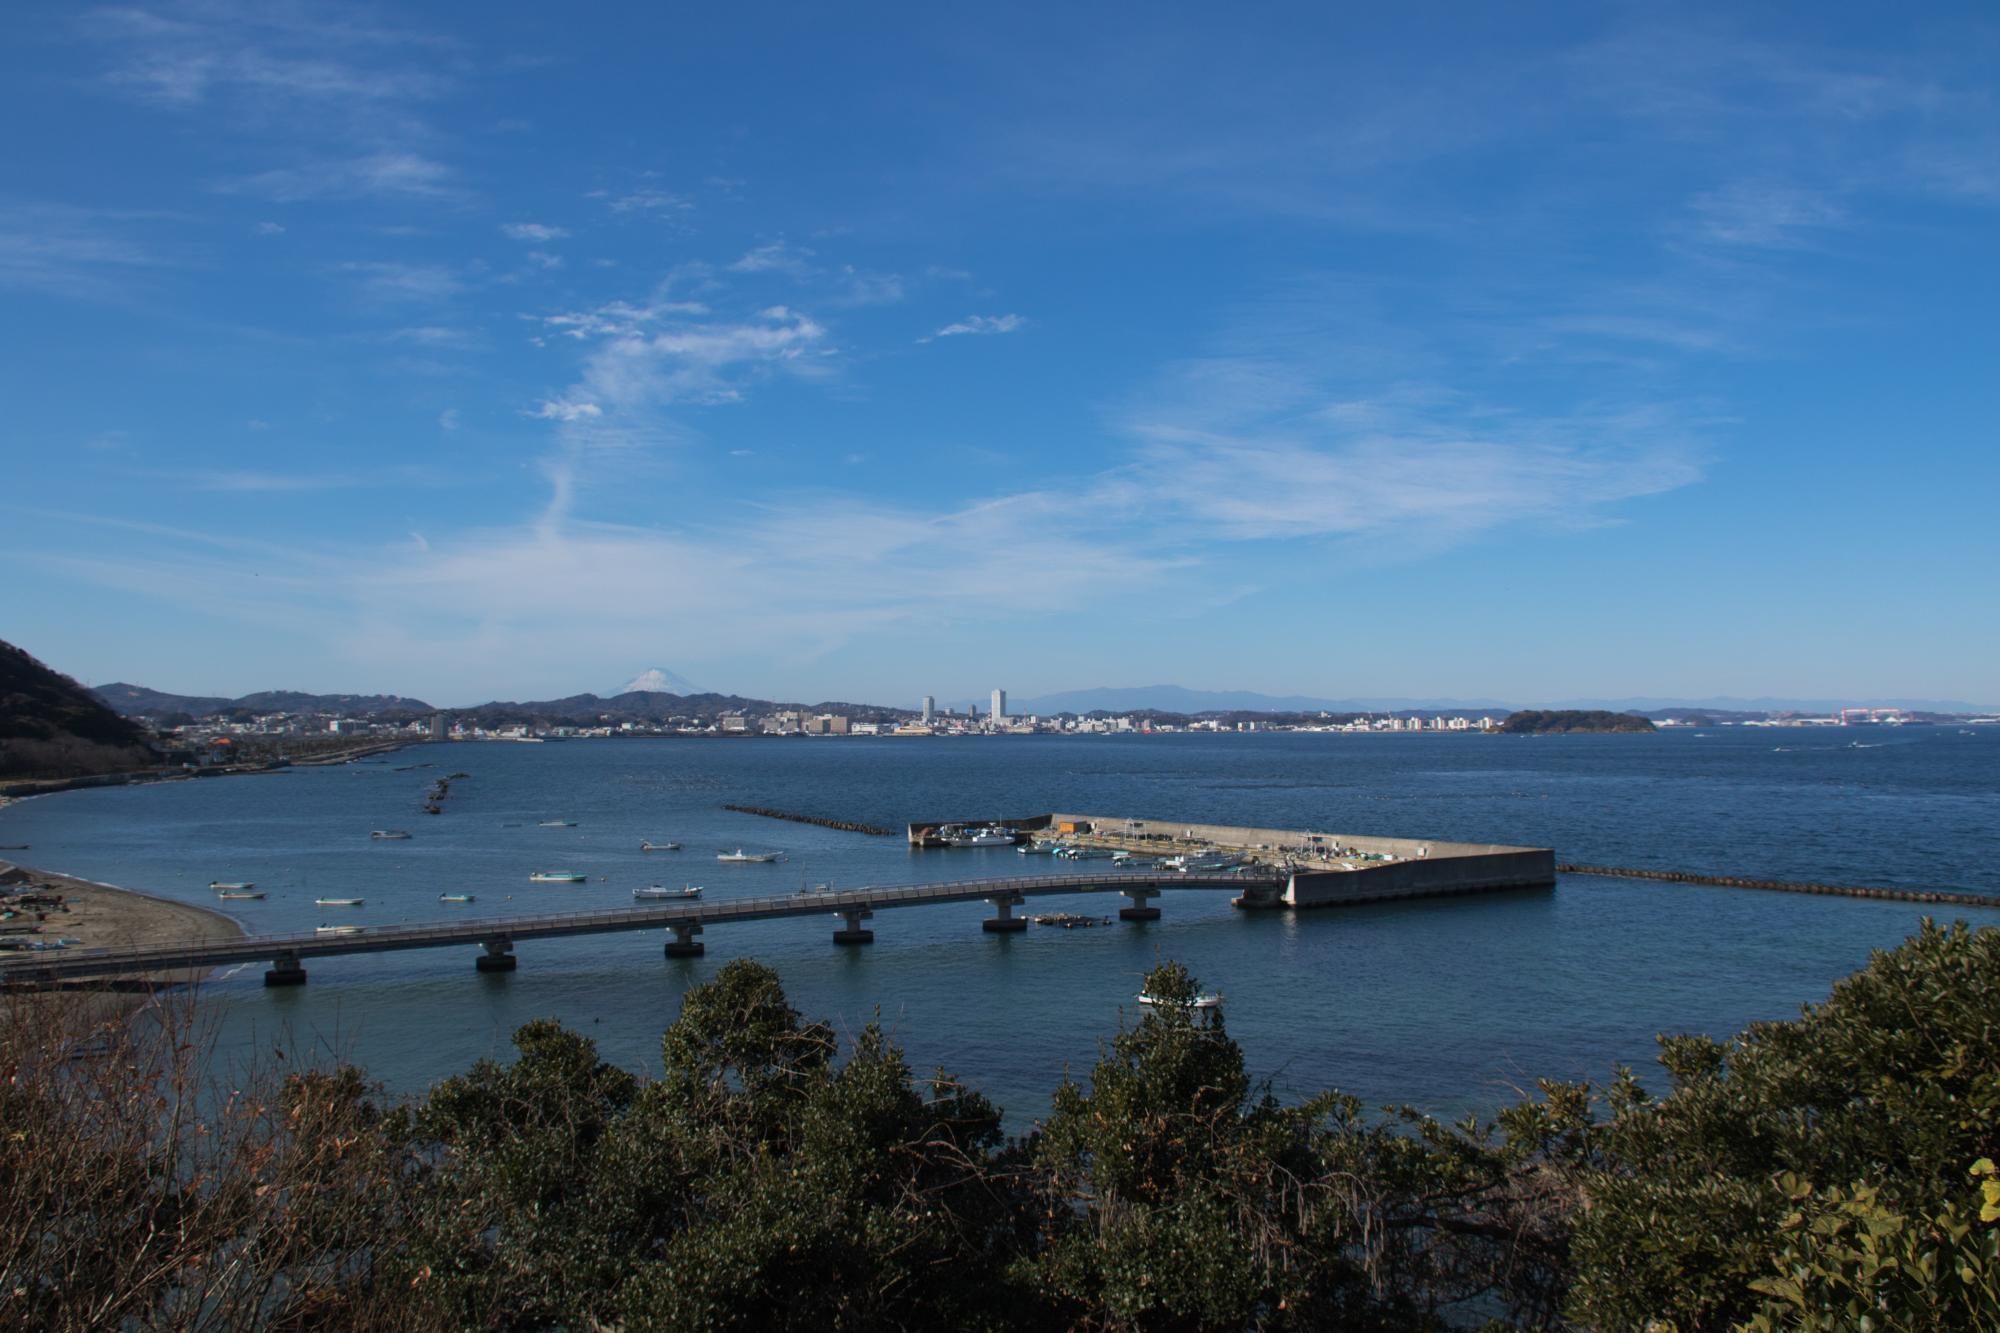 20180107_東京湾と富士山